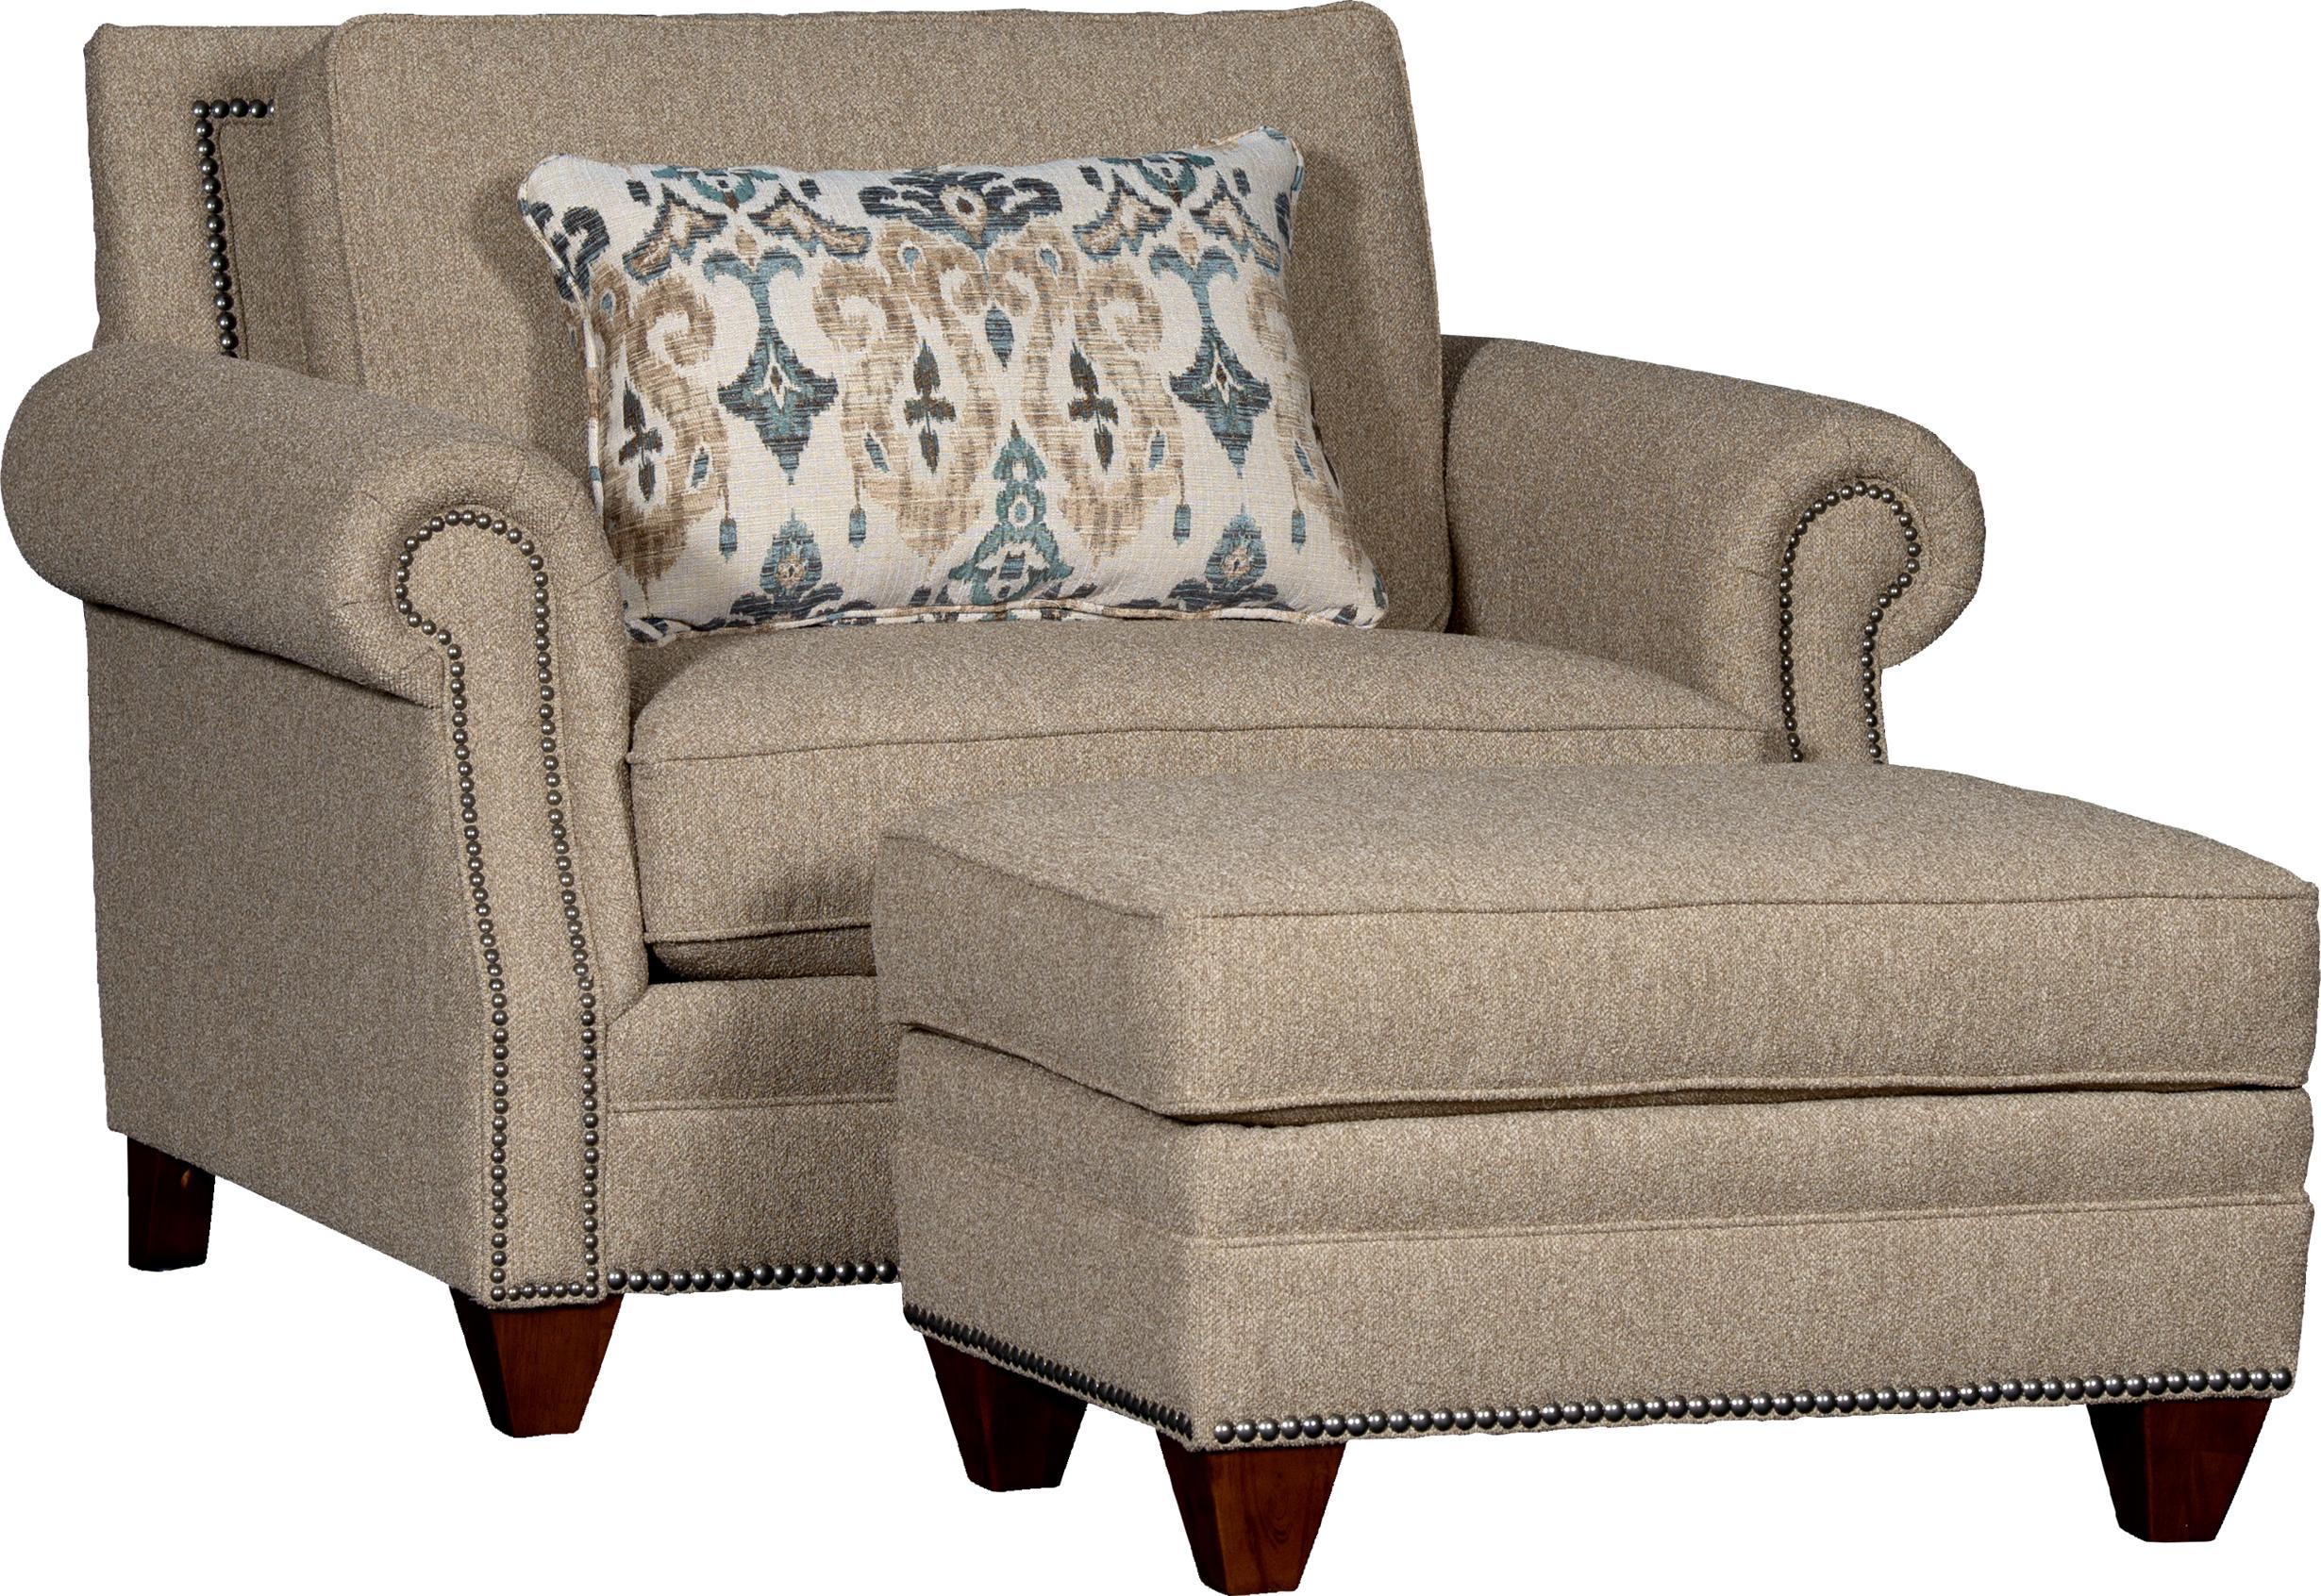 7240 Chair & Ottoman Set by Mayo at Pedigo Furniture